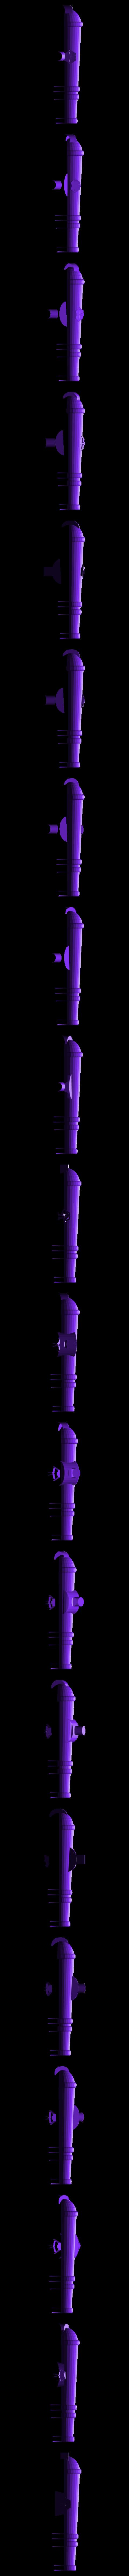 Steam_Wrist_Cannon.stl Download free STL file Modular Mech SteamPunk • Design to 3D print, mrhers2